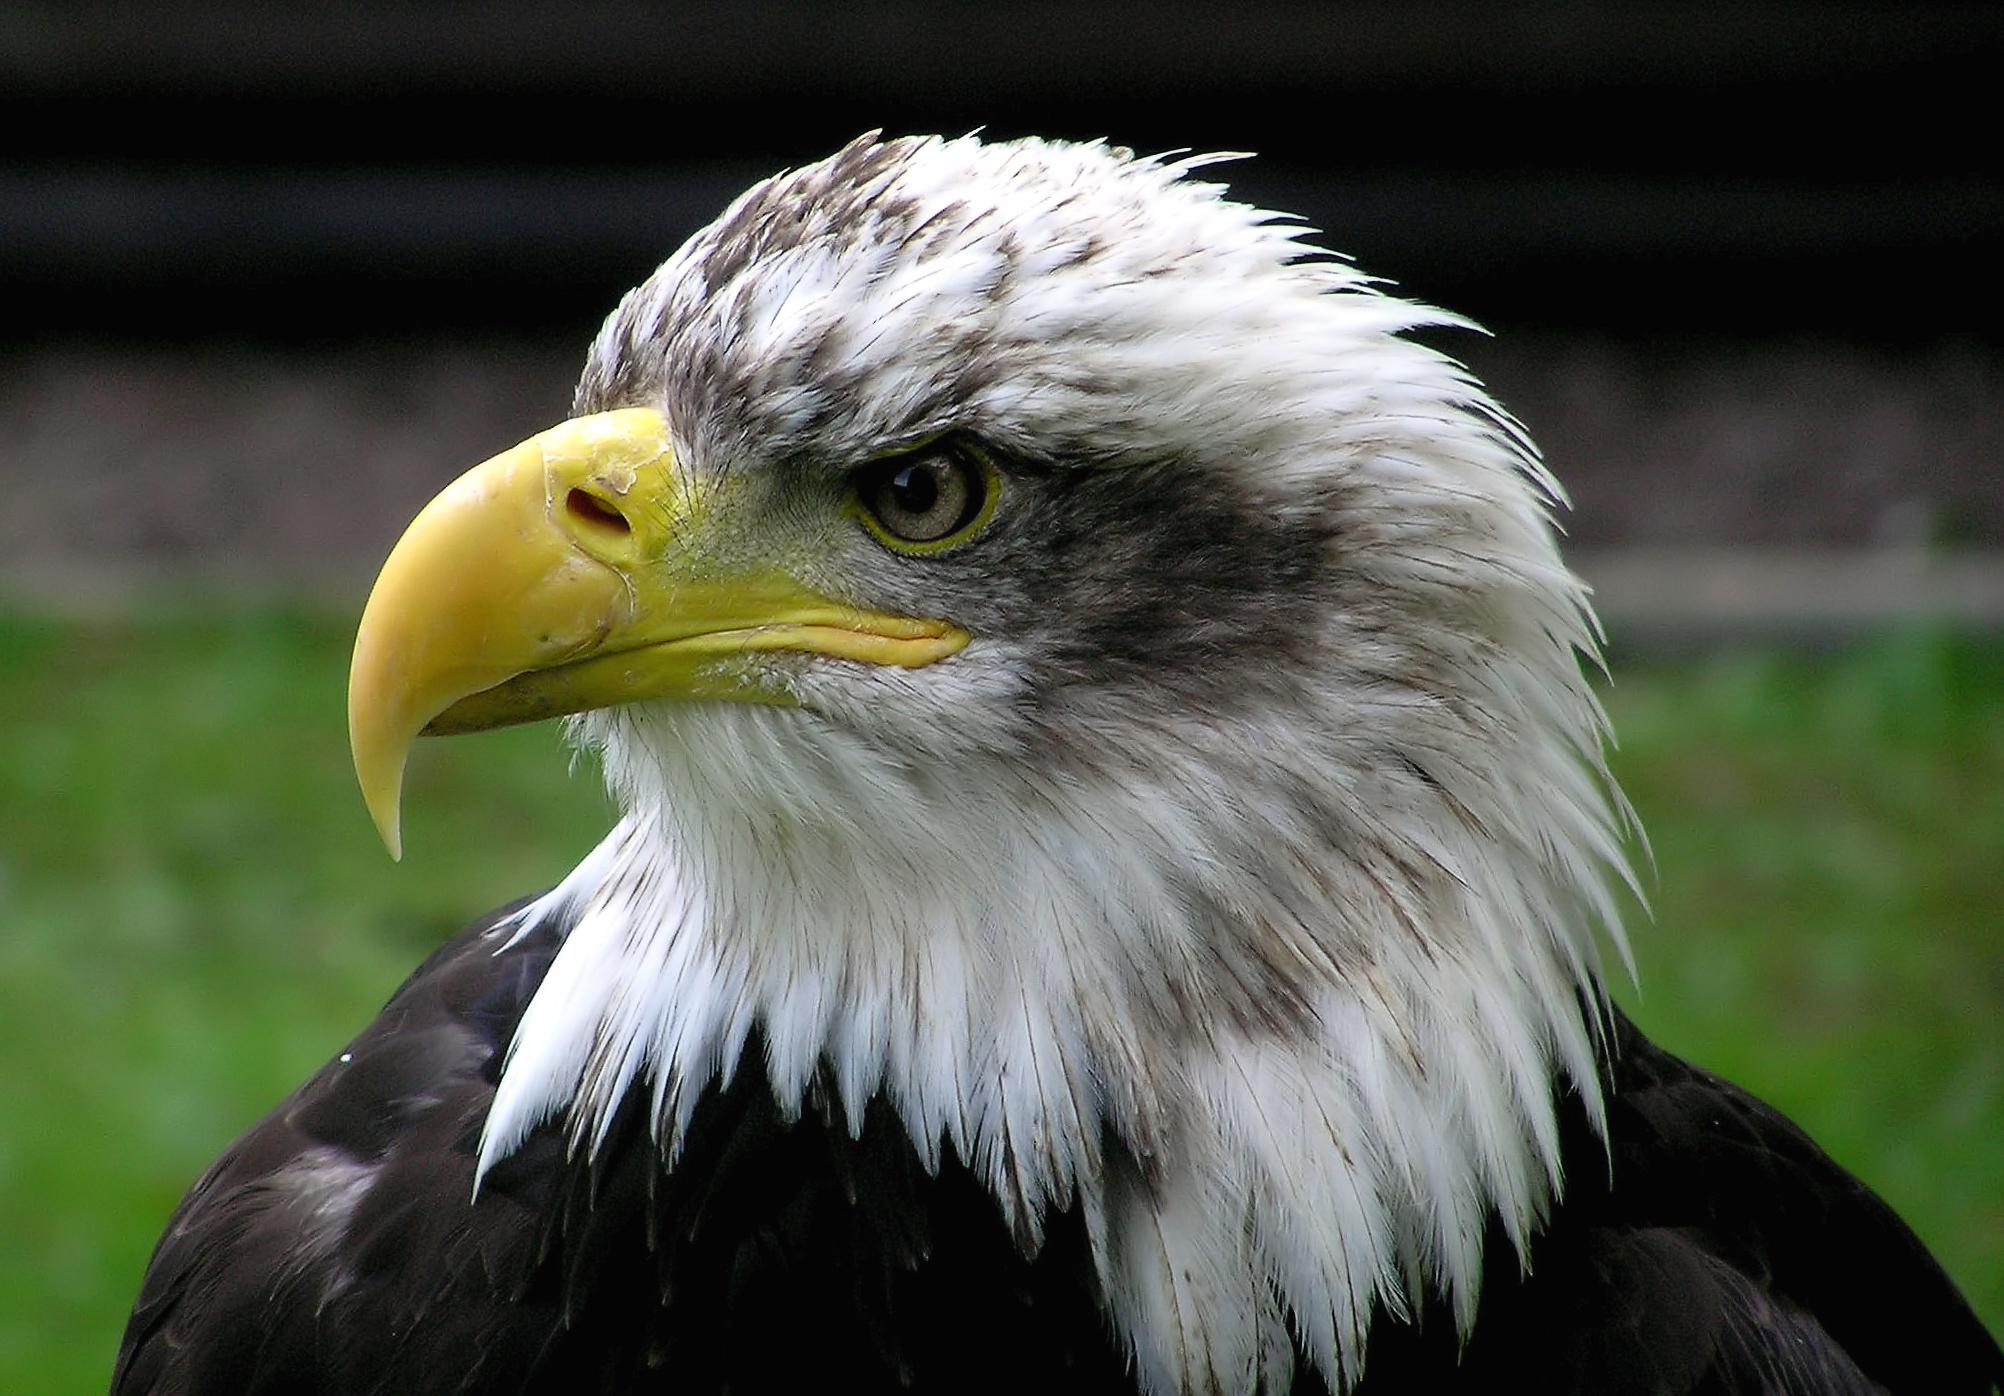 File:Bald.eagle.closeup.arp-sh.750pix.jpg - Wikipedia